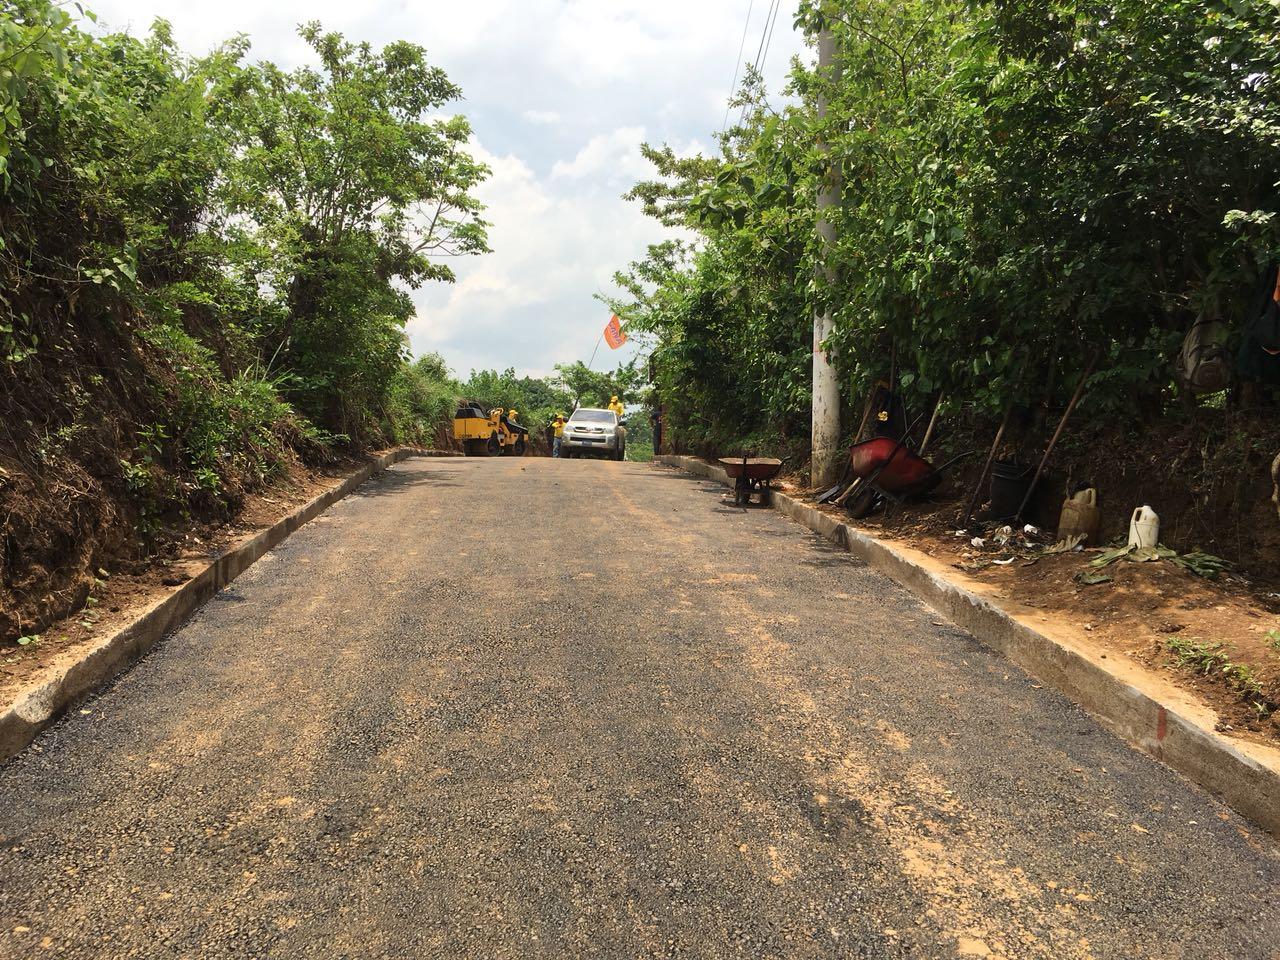 MOP por concluir pavimentación de calle Cantón El Almendro, Sonzacate, Sonsonate